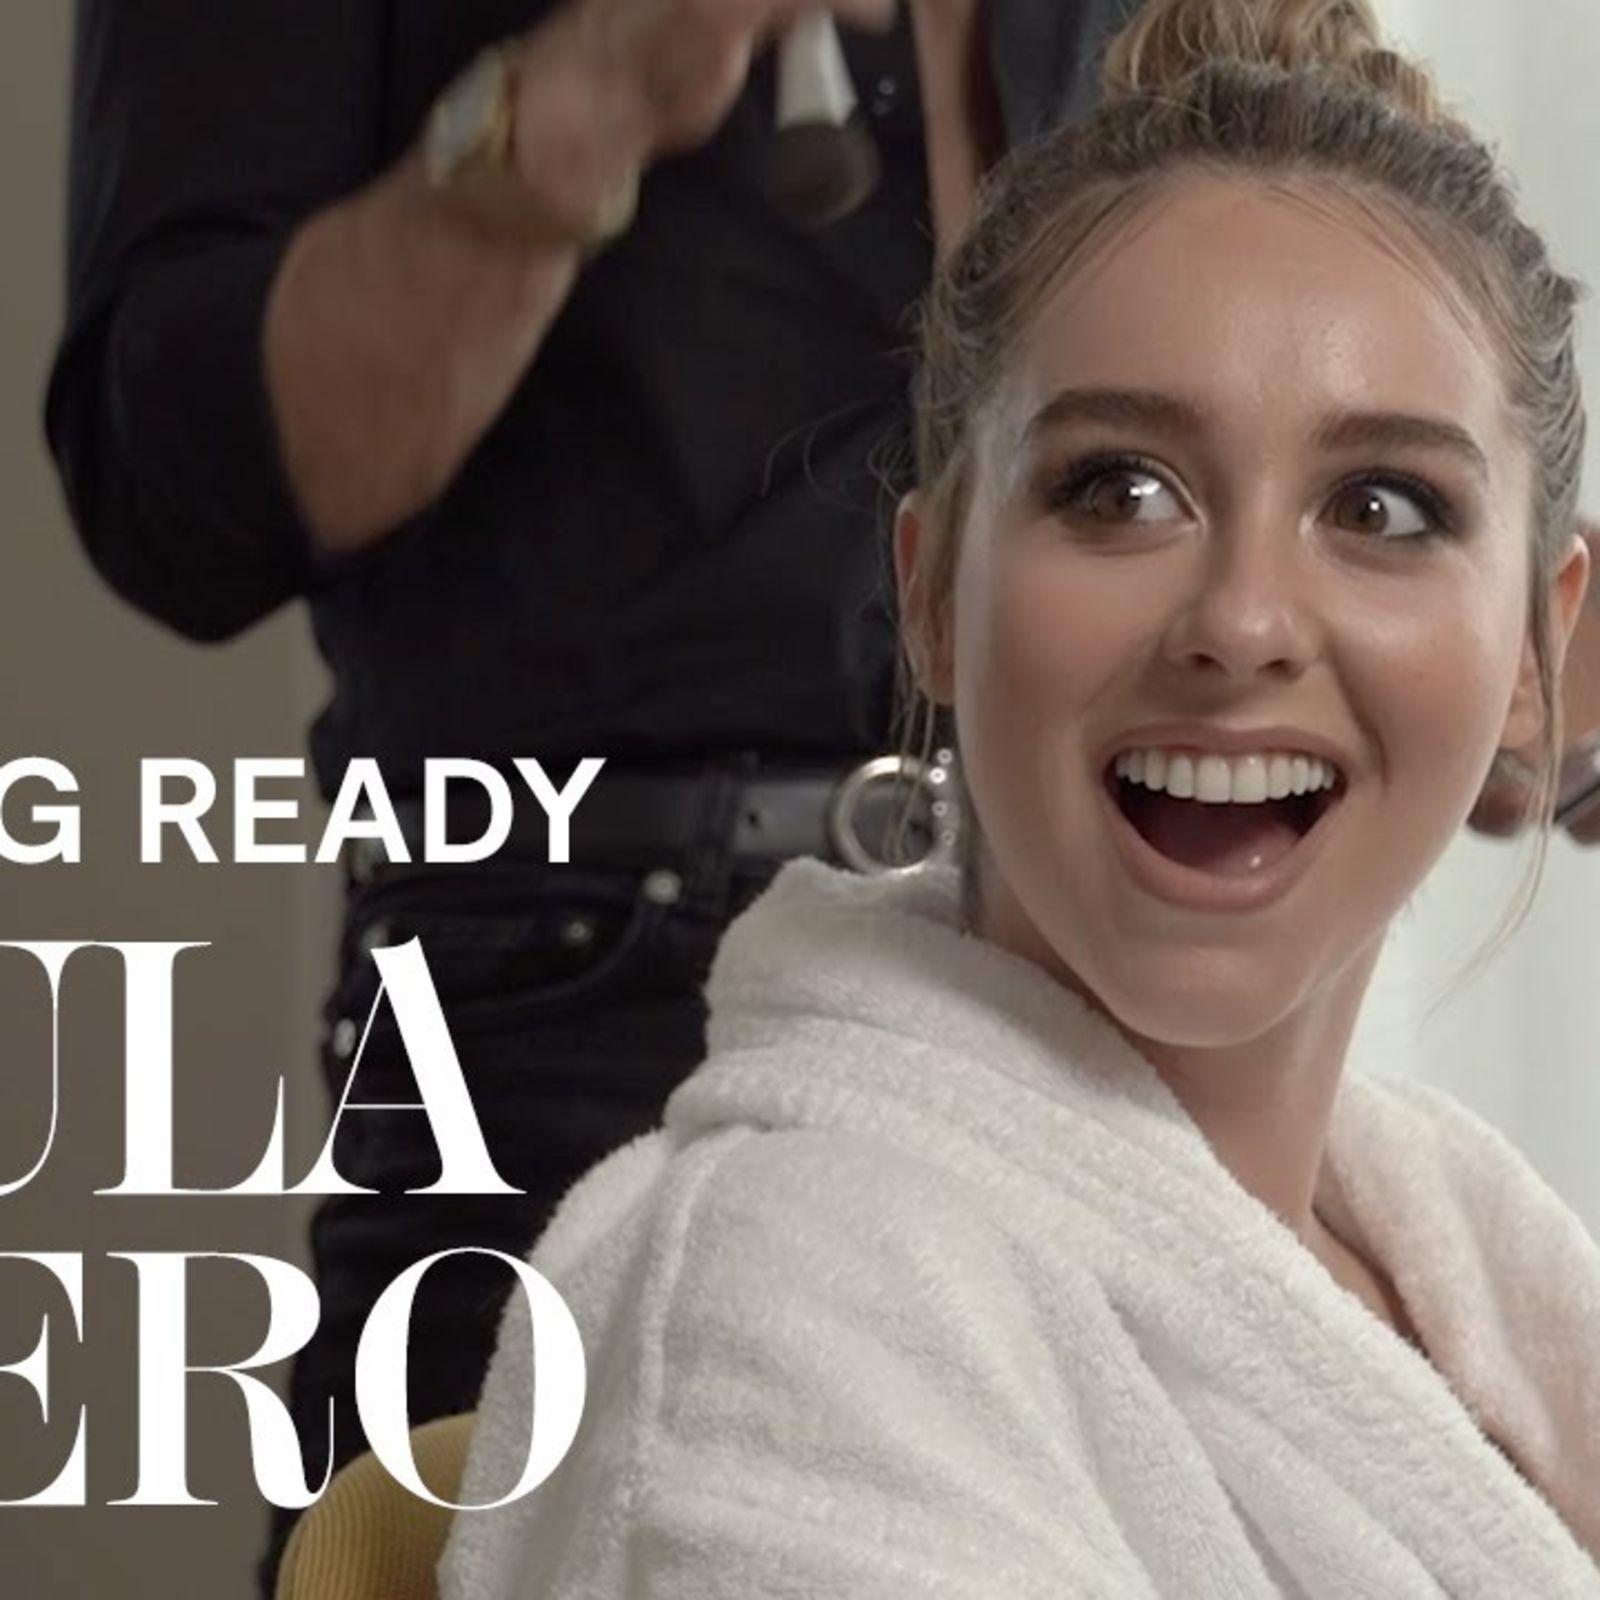 Paula Usero se prepara para los Premios Feroz 2021 | Getting ready